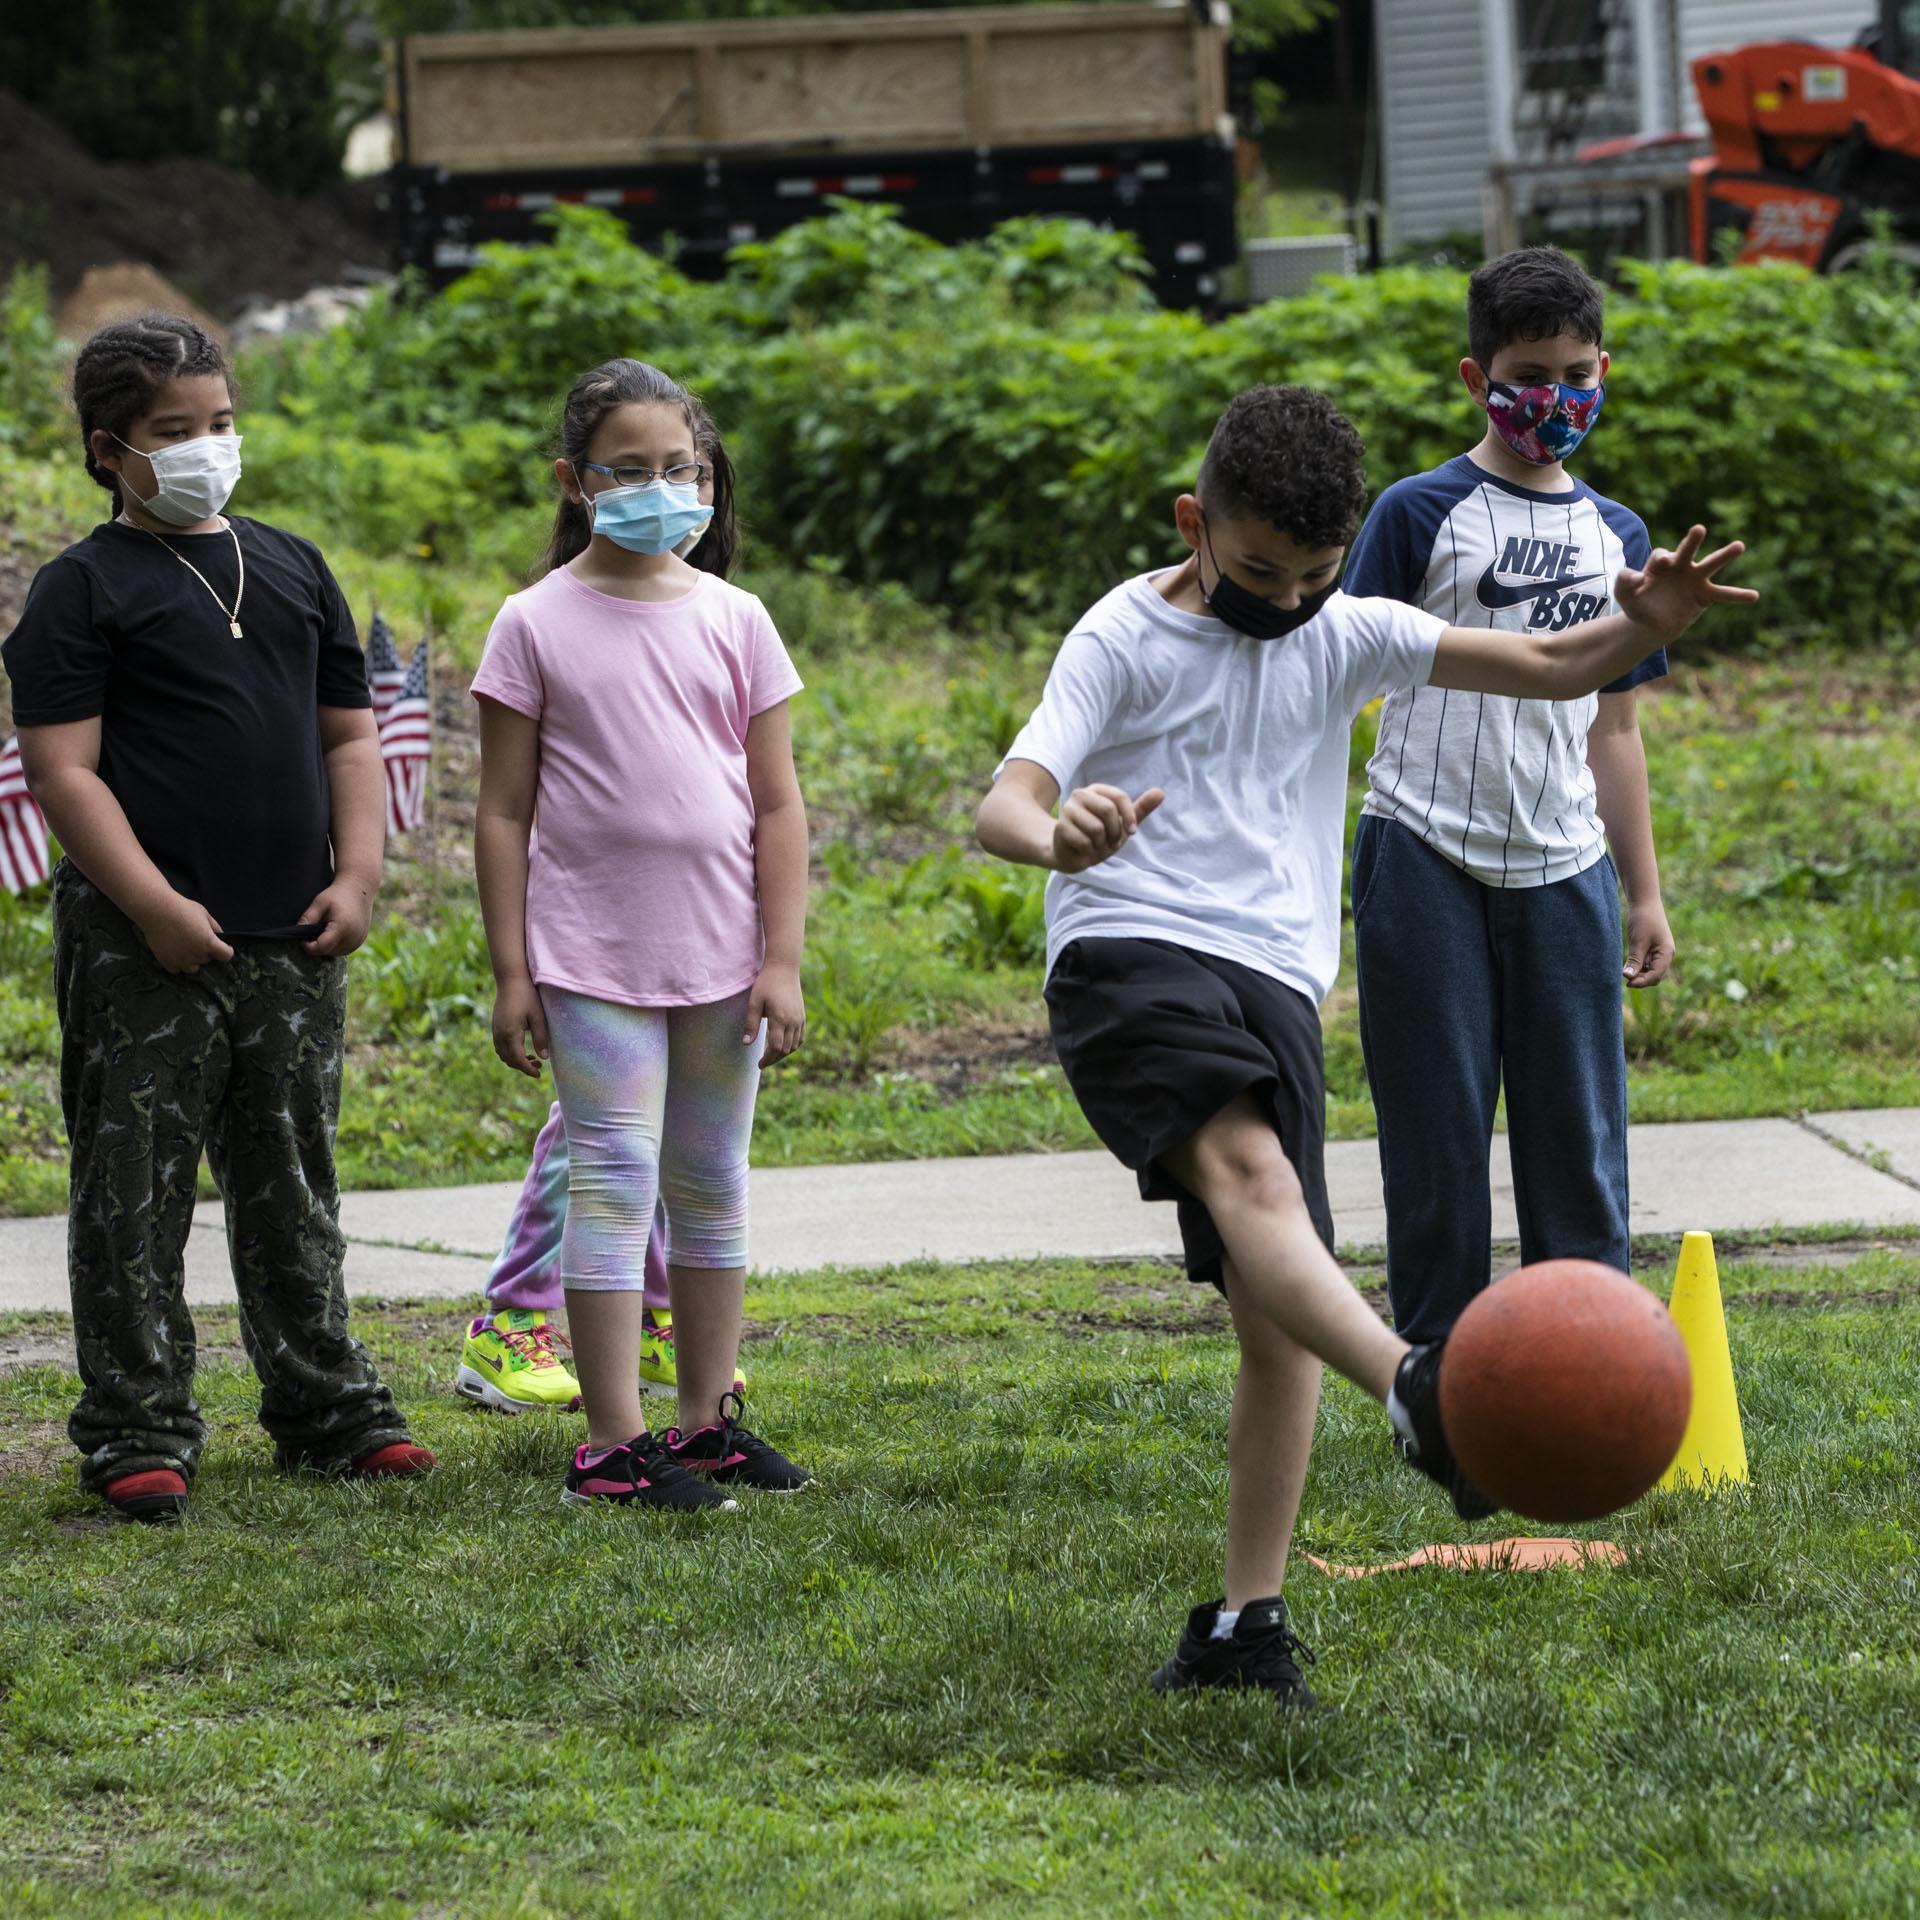 Student kicking ball